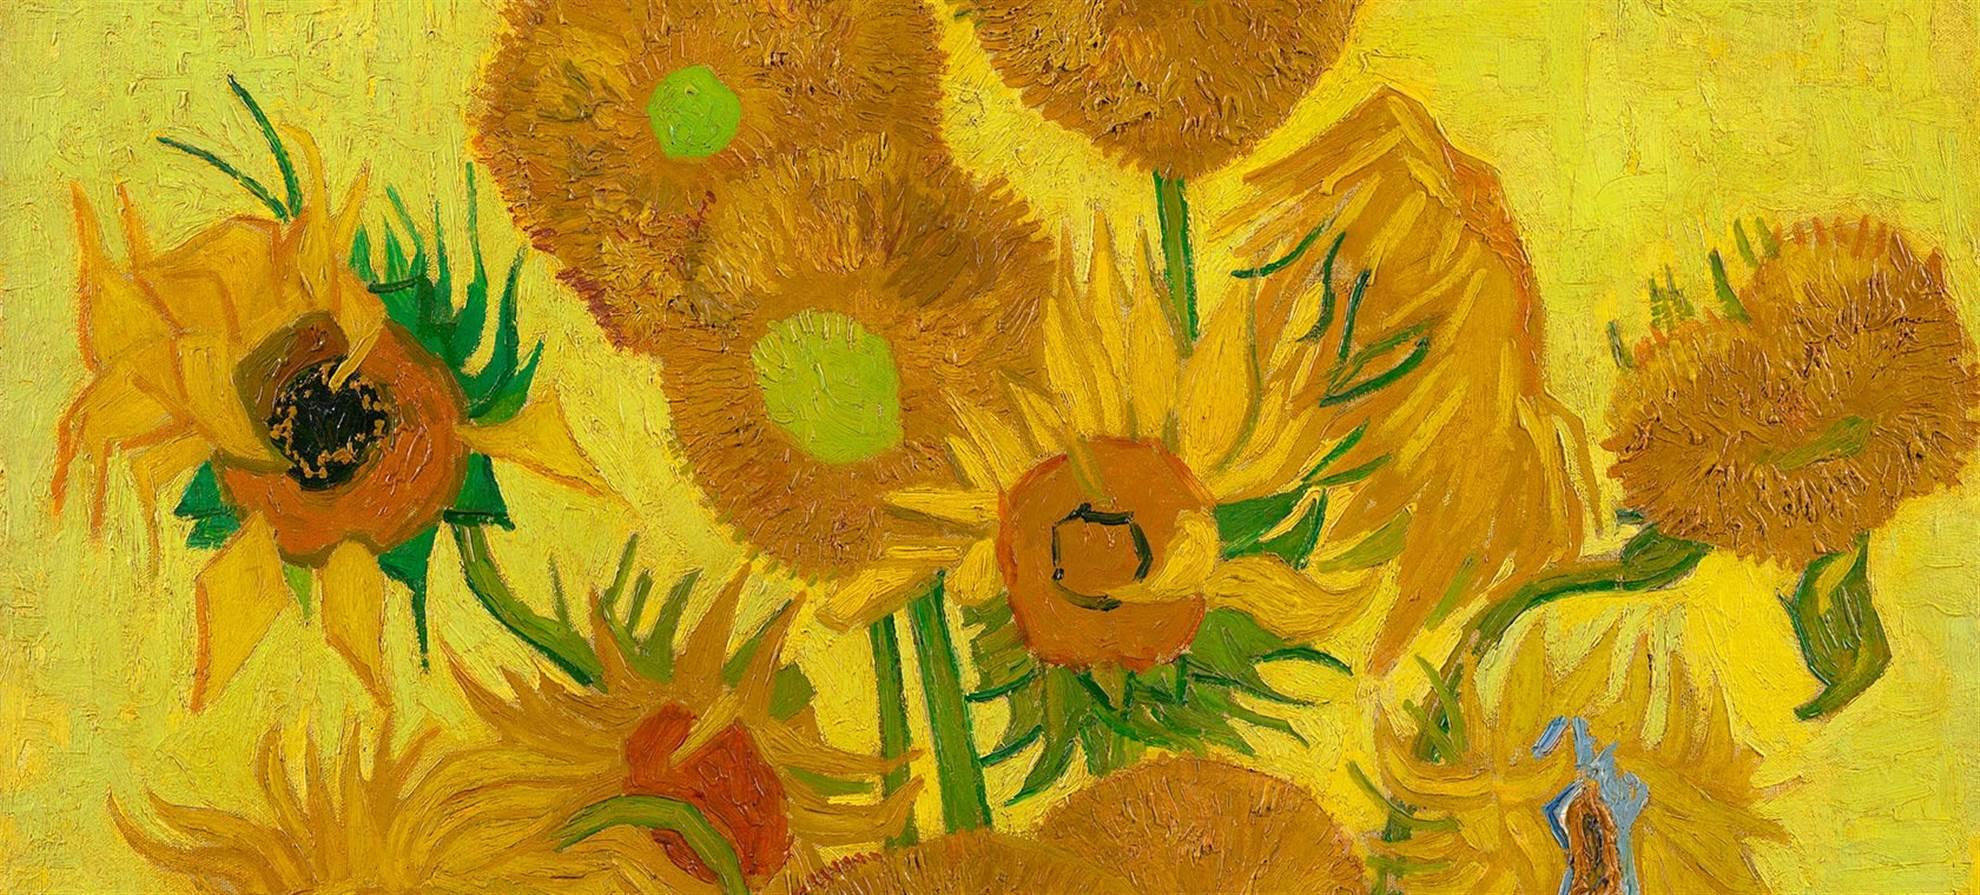 Billet til Van Gogh-museet & Kanalrundfart